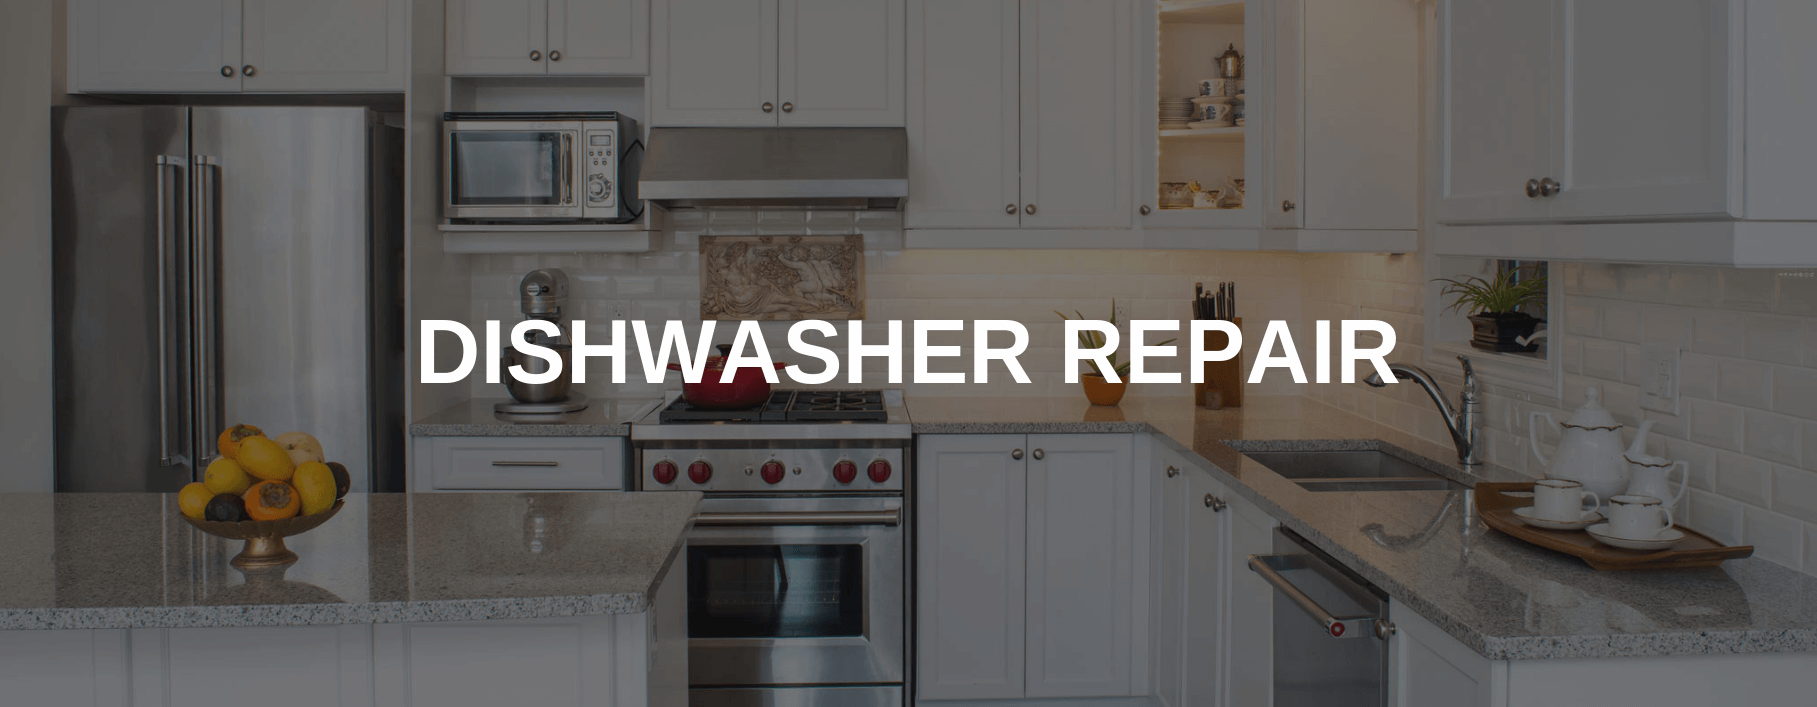 dishwasher repair fort worth